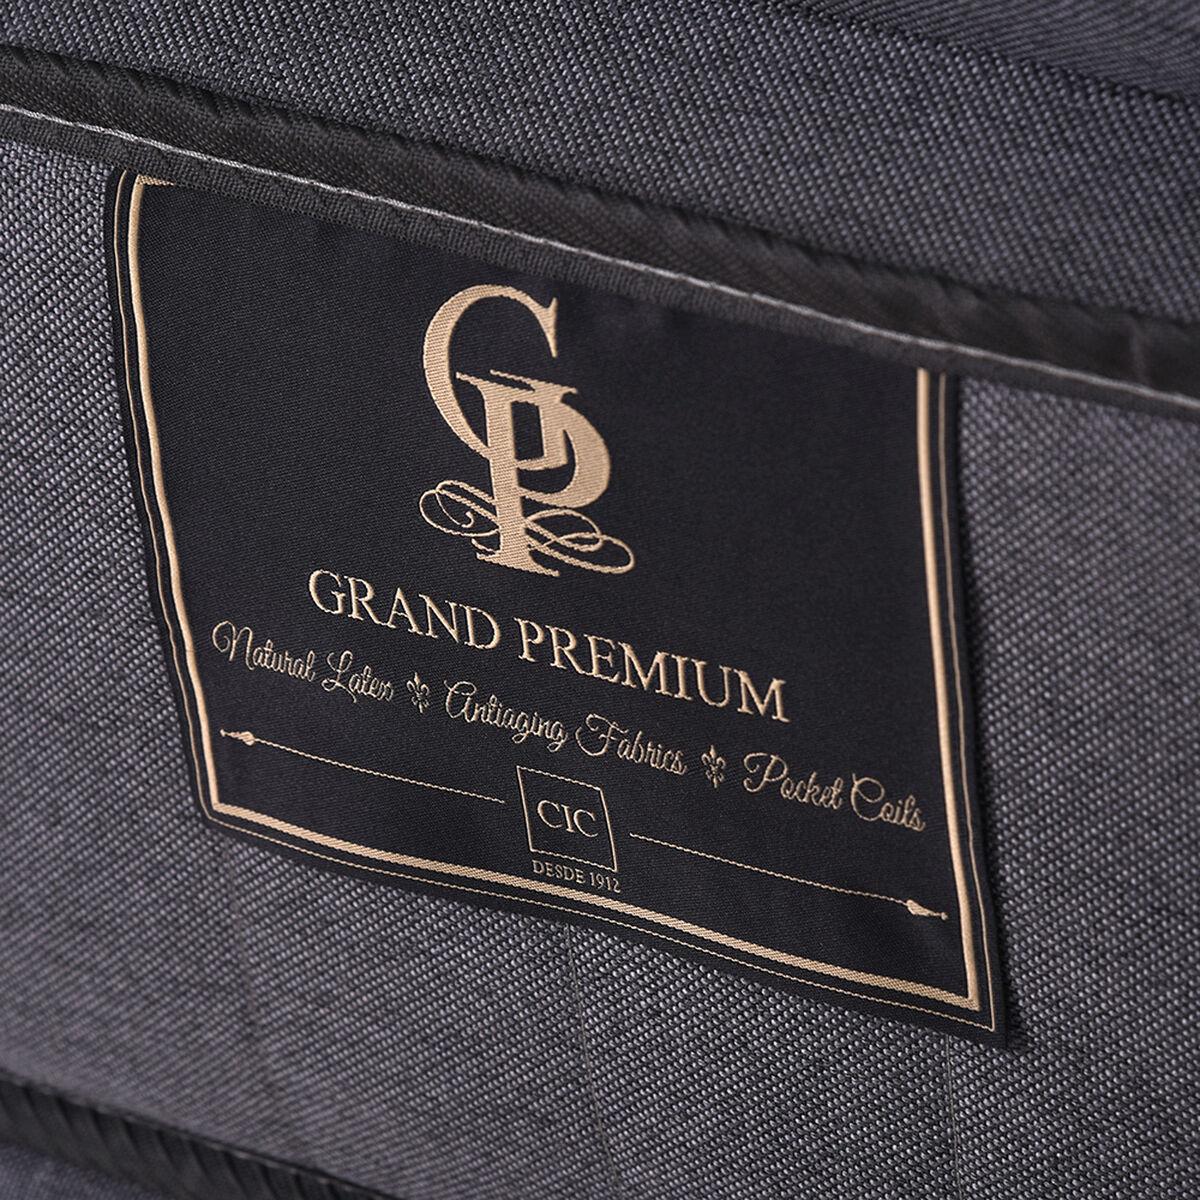 Cama Europea CIC Base Dividida King Grand Premium + Respaldo + 2 Veladores Tamesis